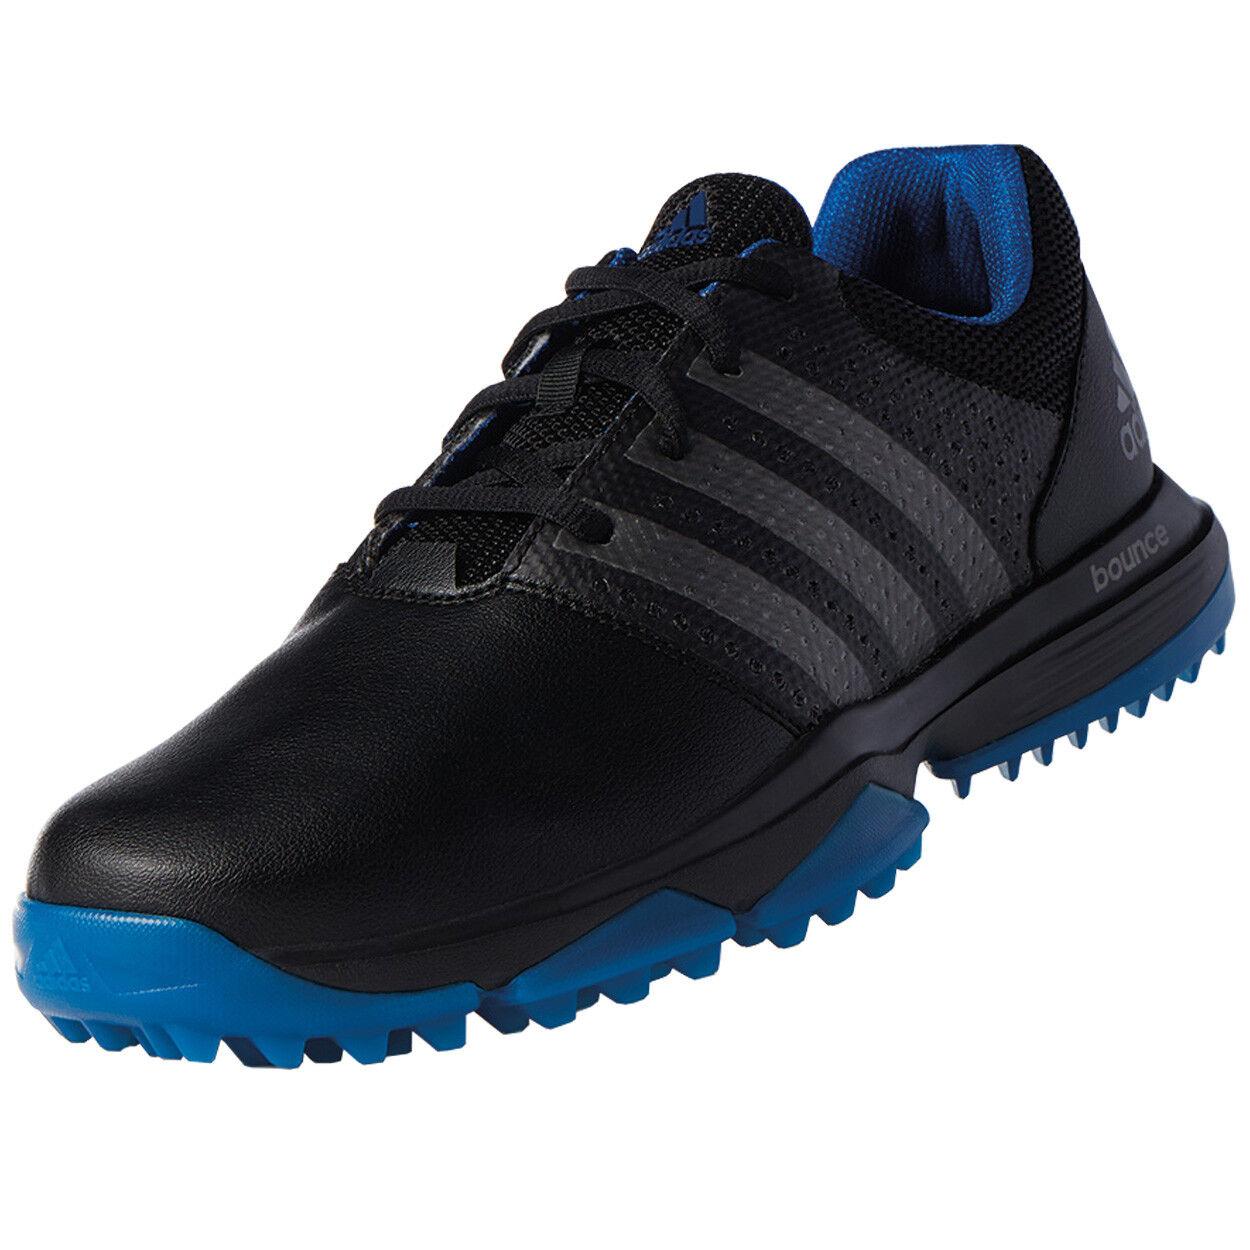 Adidas Chaussures de golf 360 Traxion pour hommes